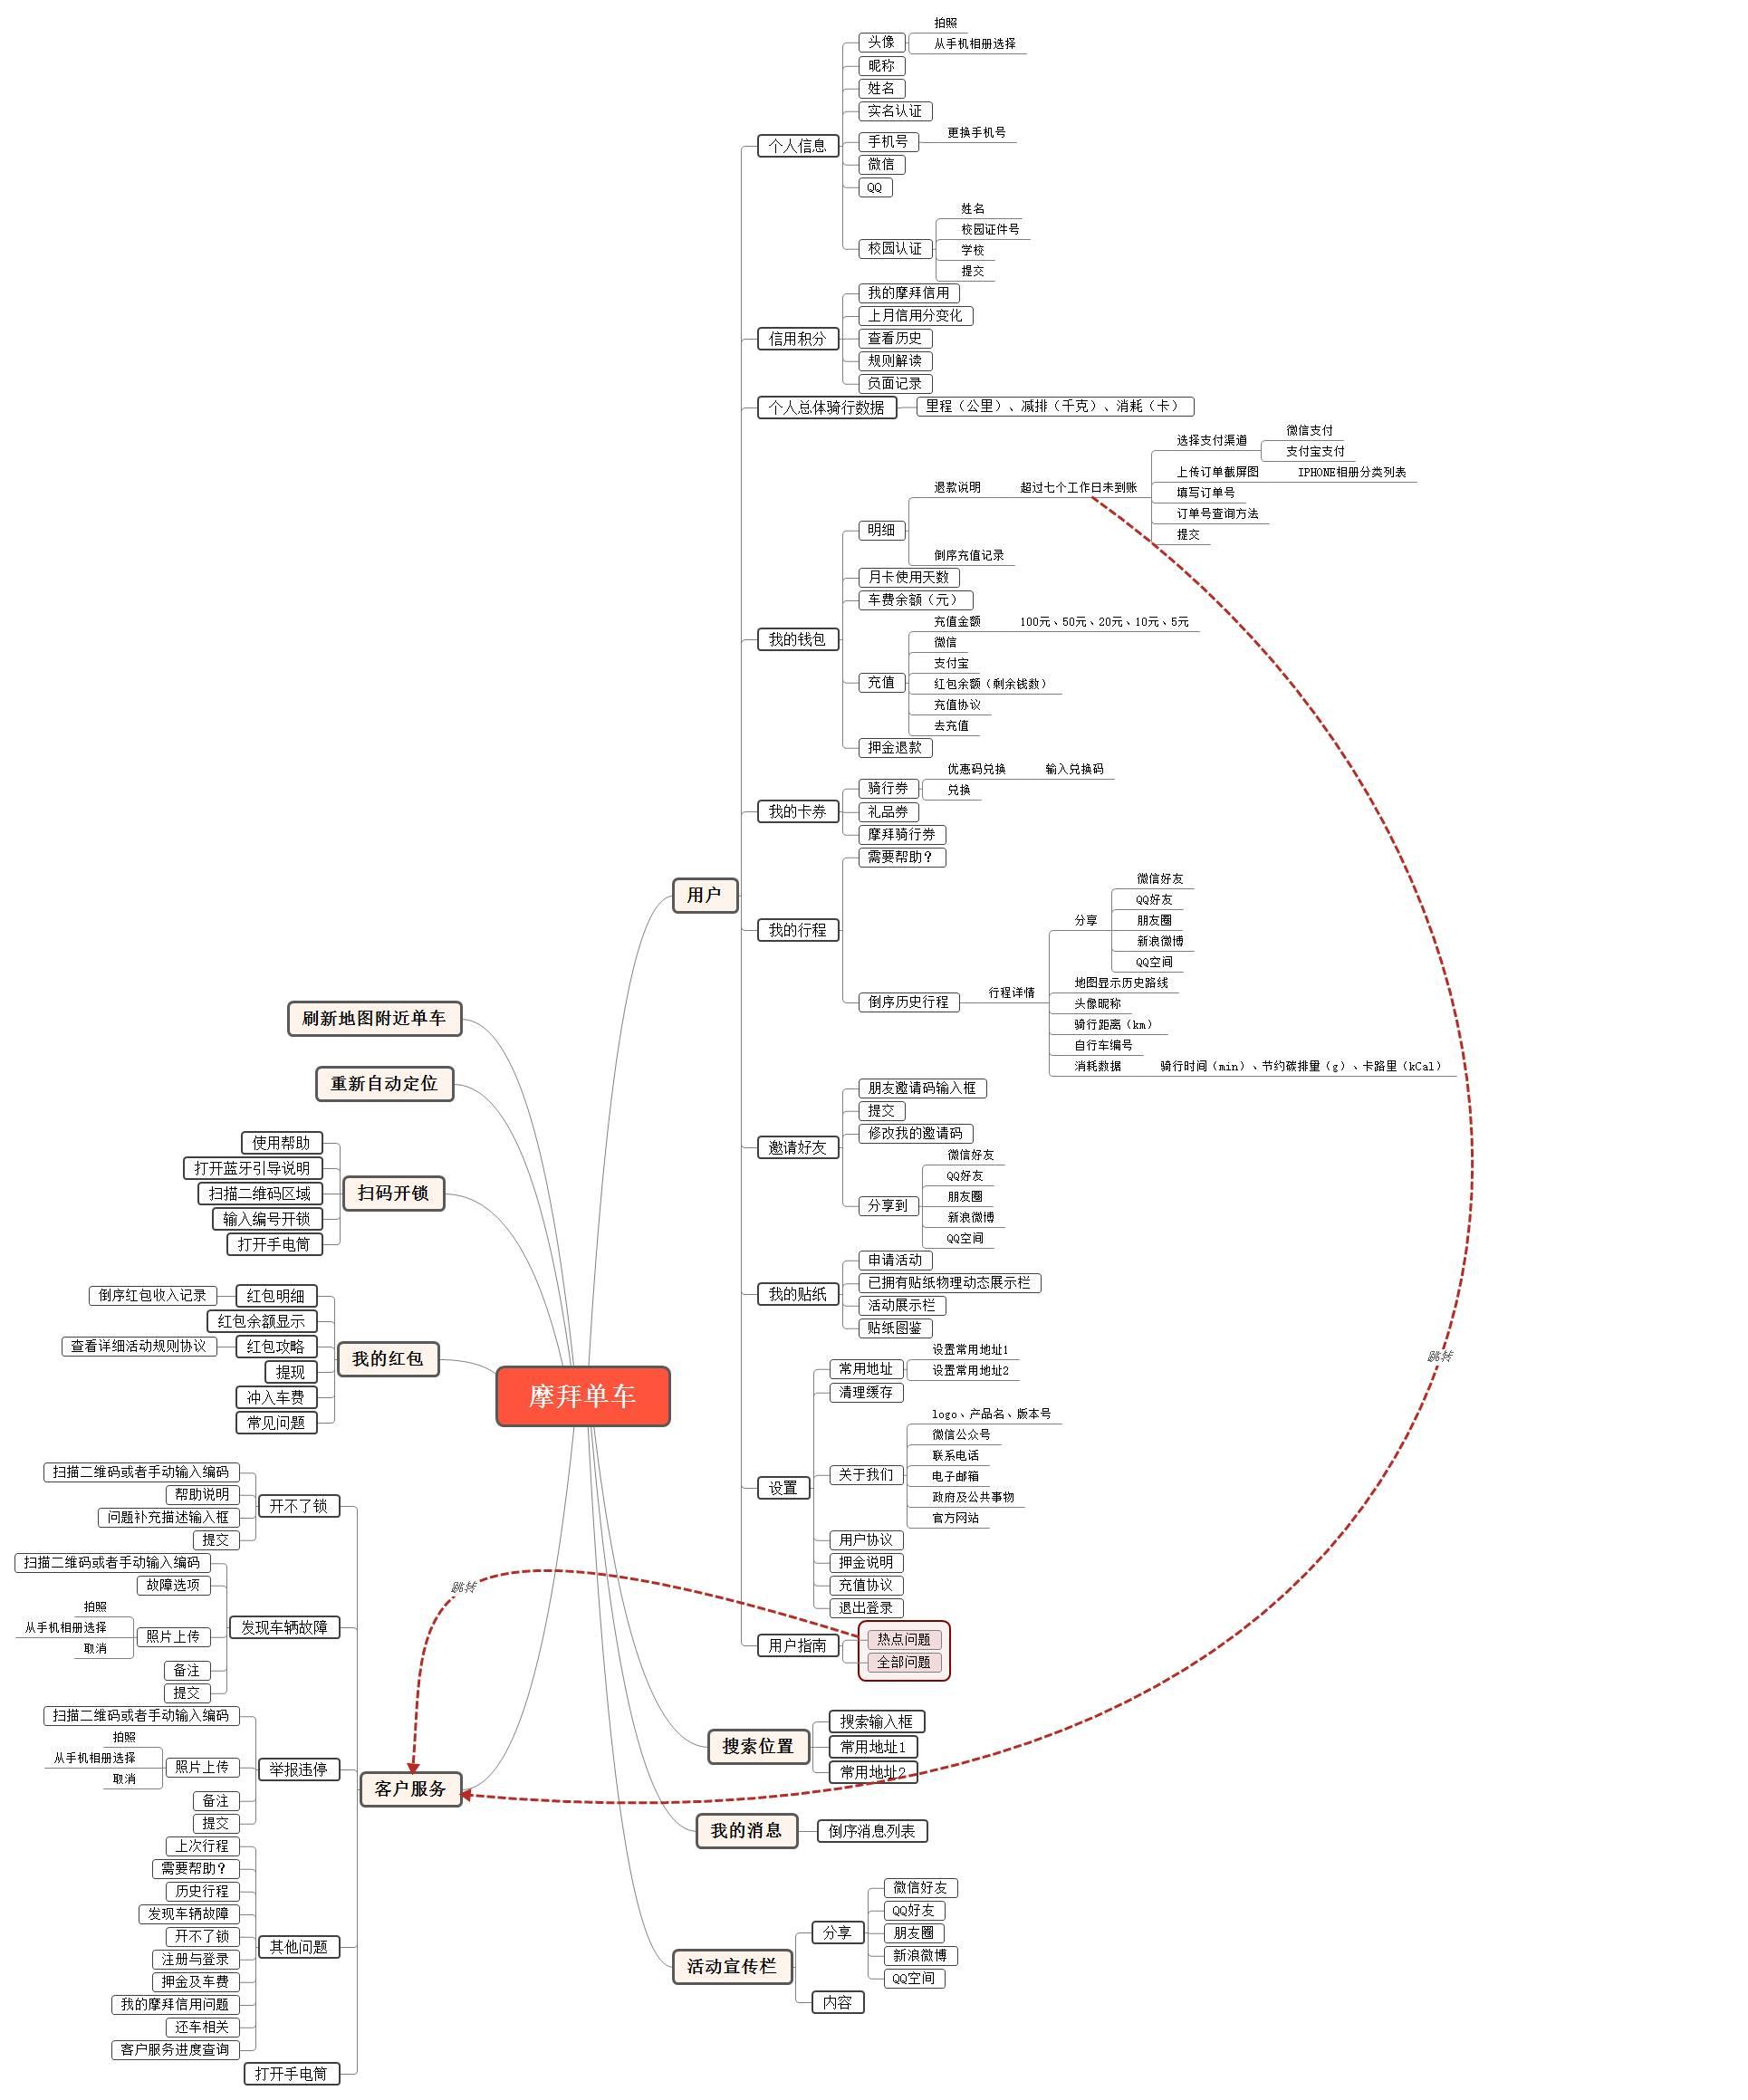 2.ofo共享单车产品结构图